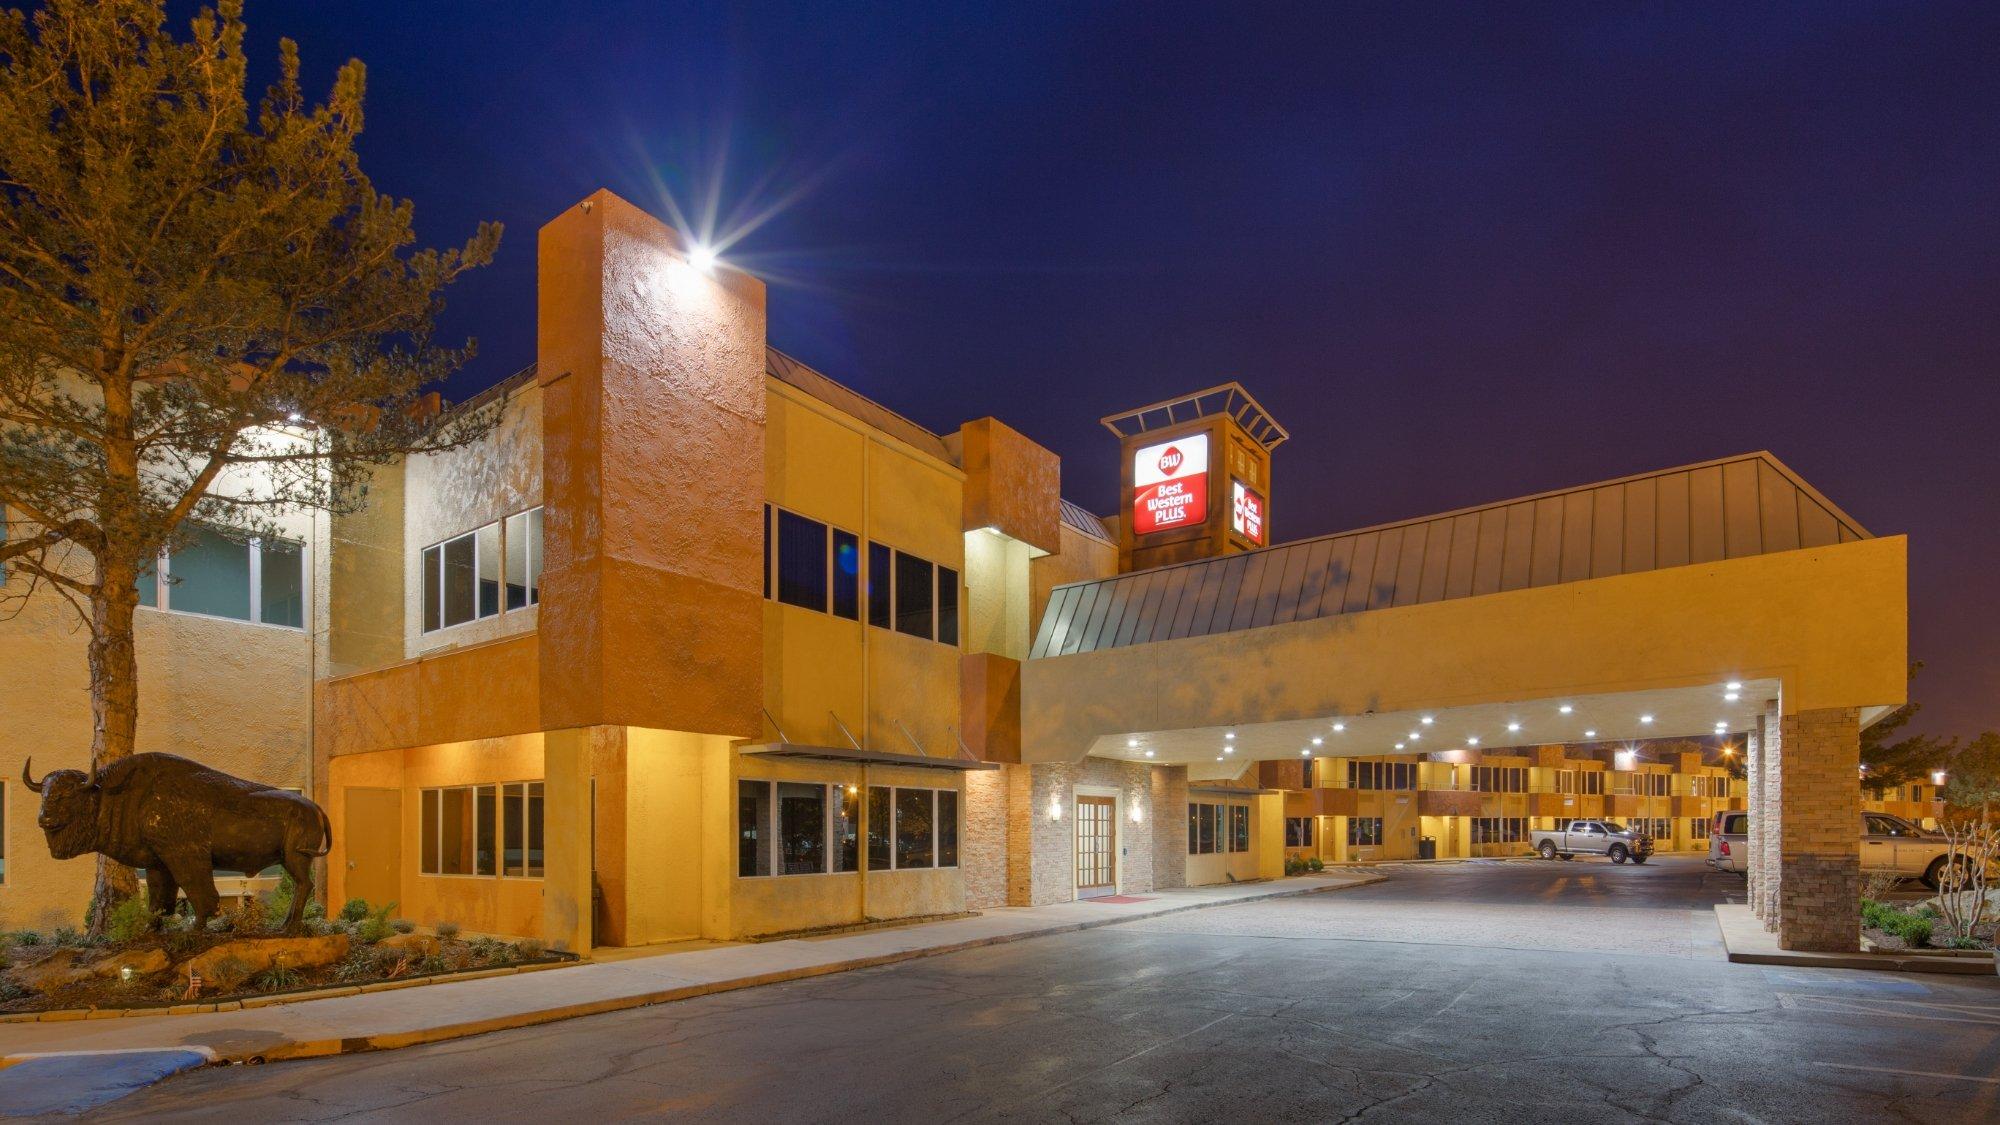 Best Western Plus Lawton Hotel & Convention Center